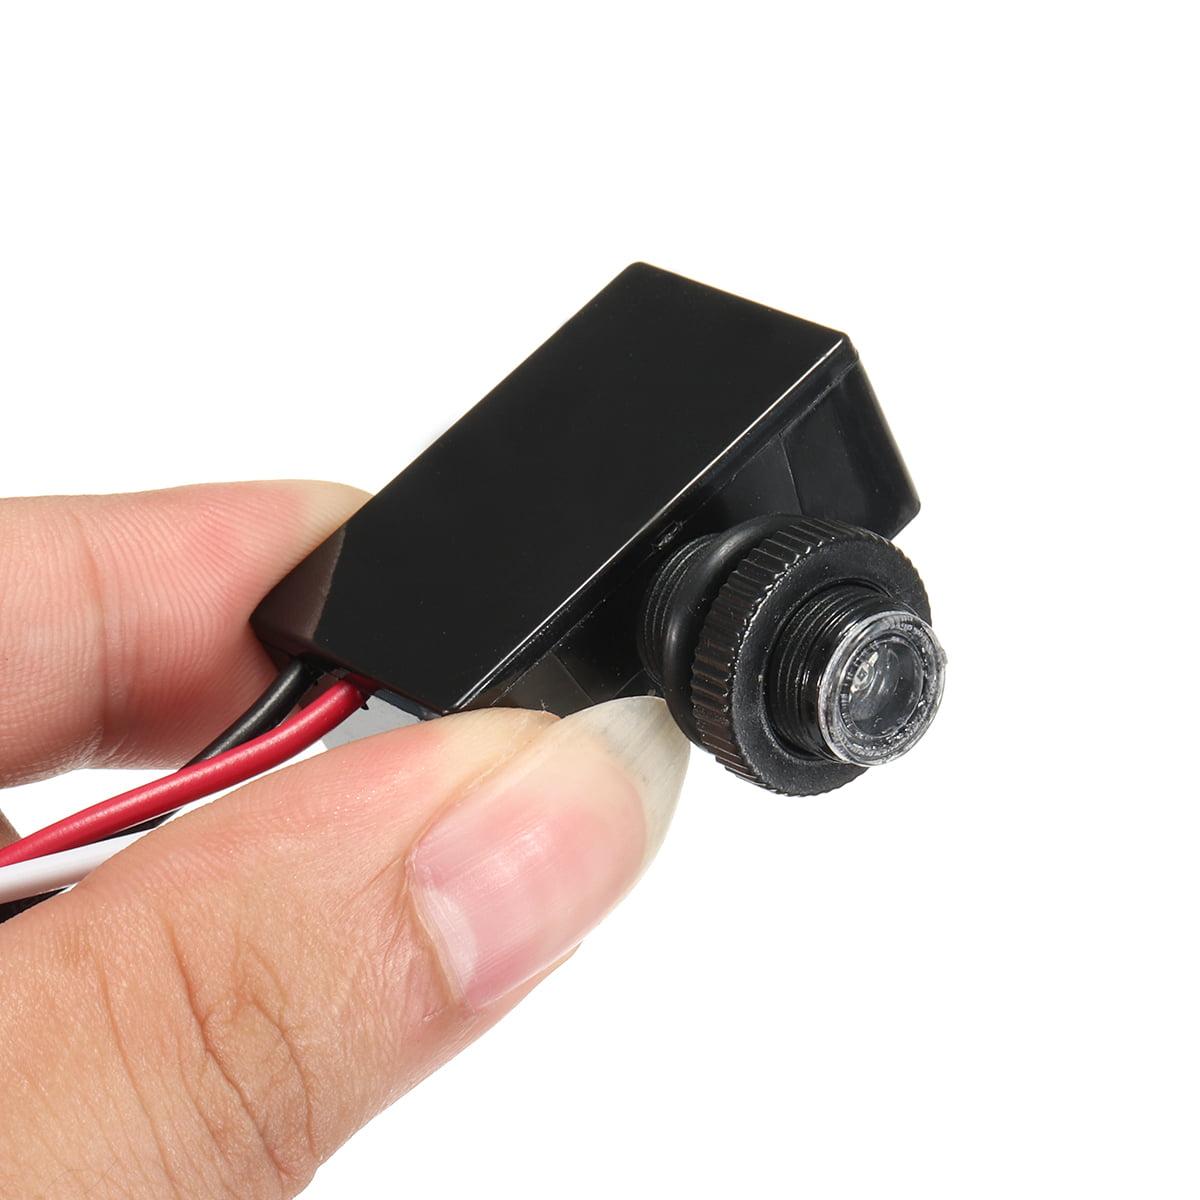 AC80~277V Photocell Dusk to Dawn Button Photo Control Eye Switch ControllerV TB